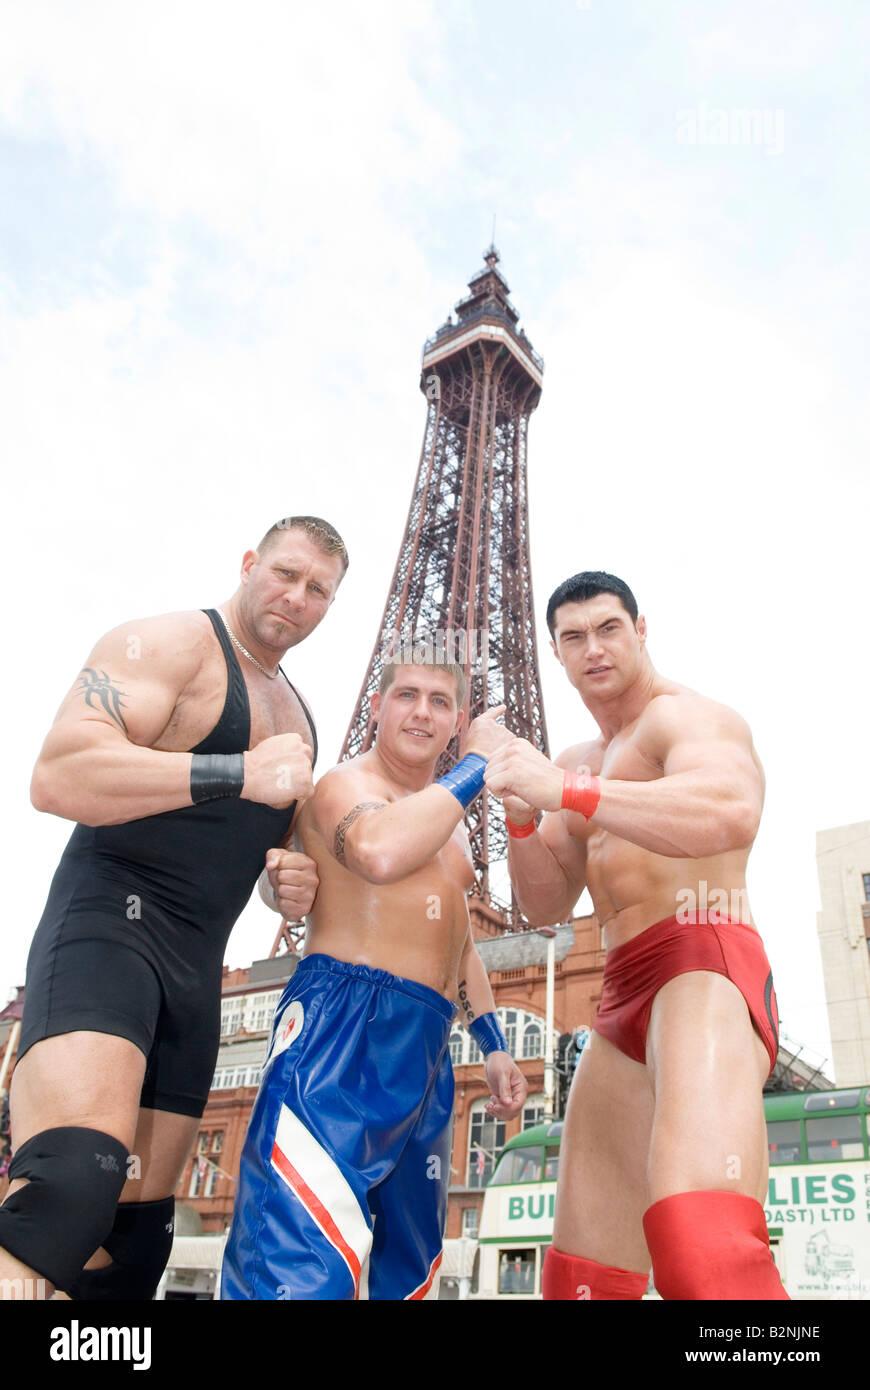 American style superslam wrestlers - Stock Image